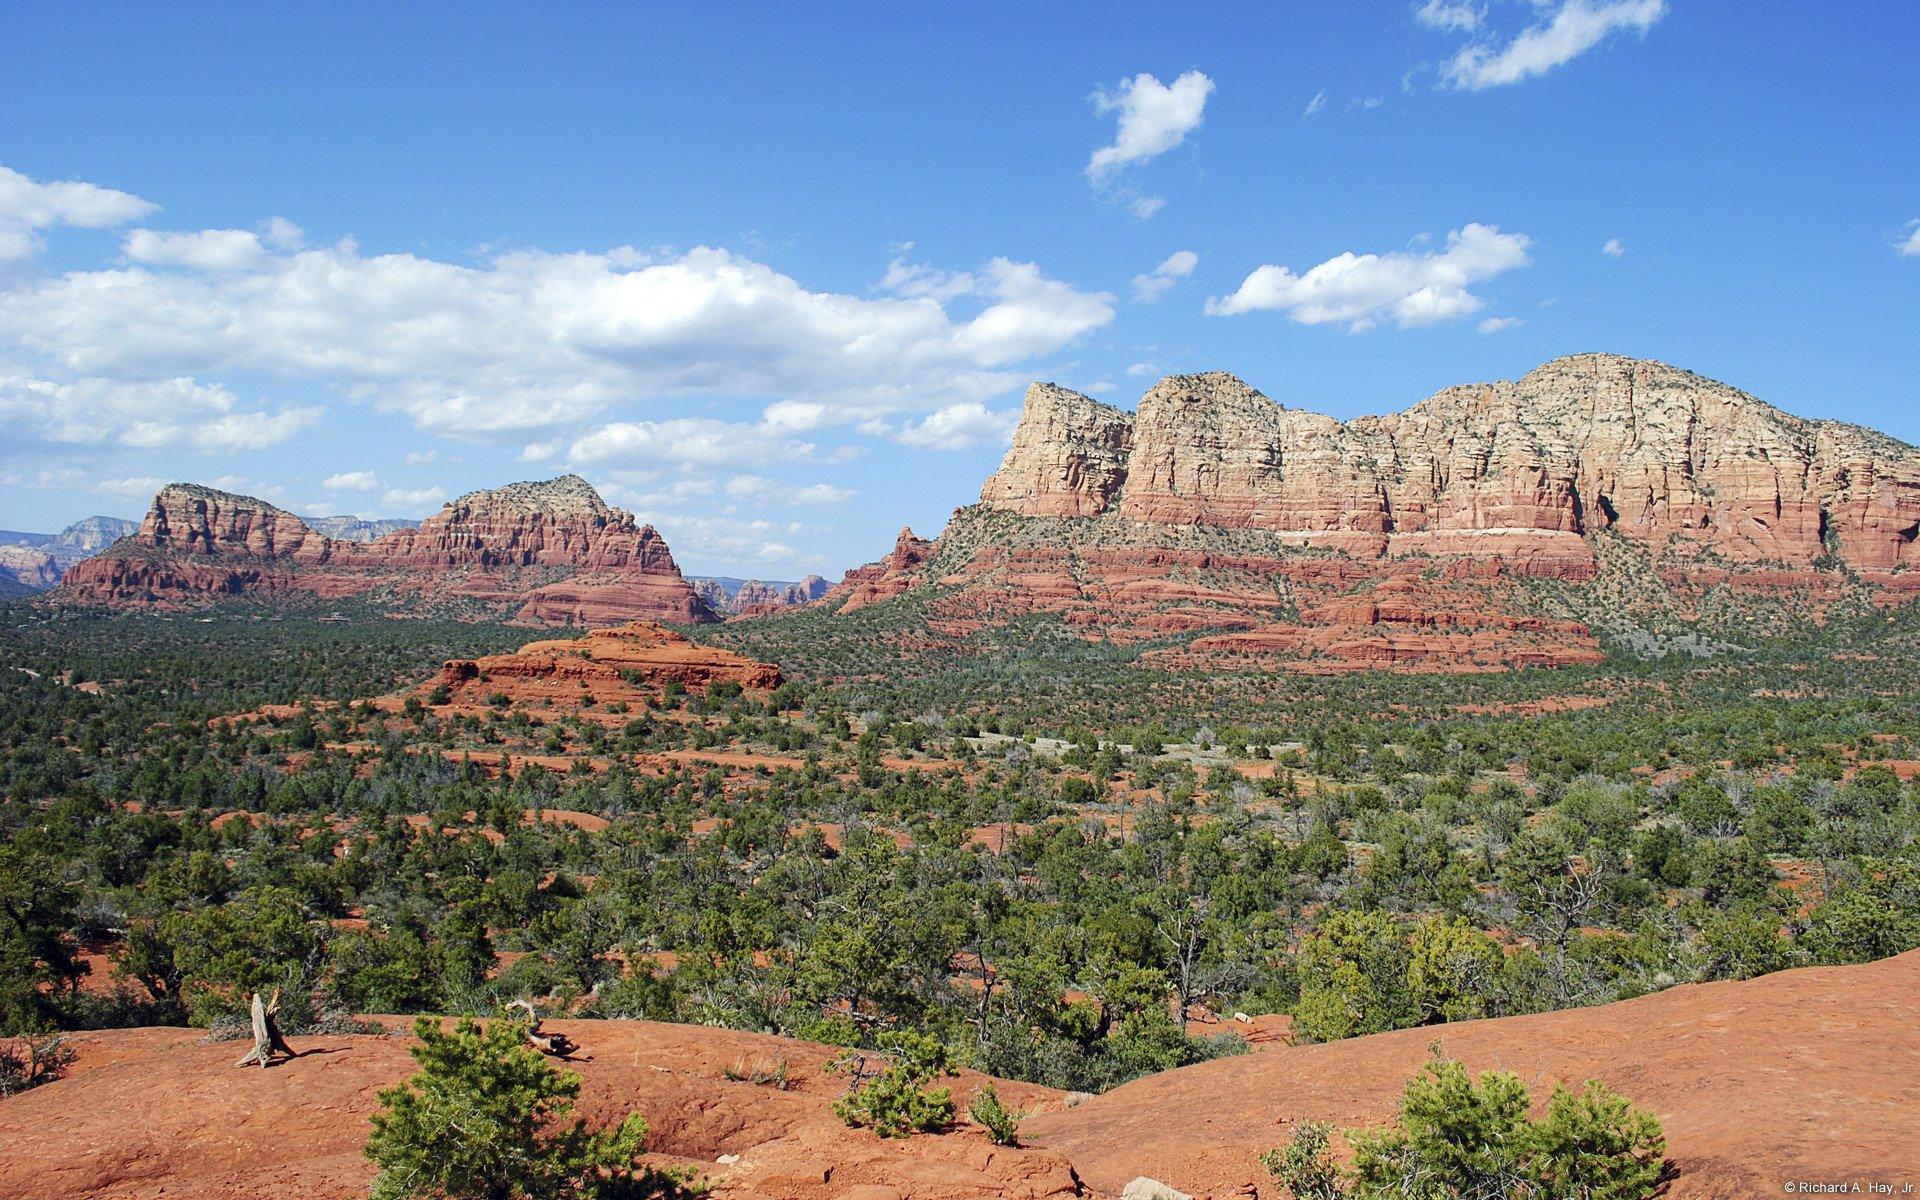 Red Rocks near Sedona (Arizona, U.S.)